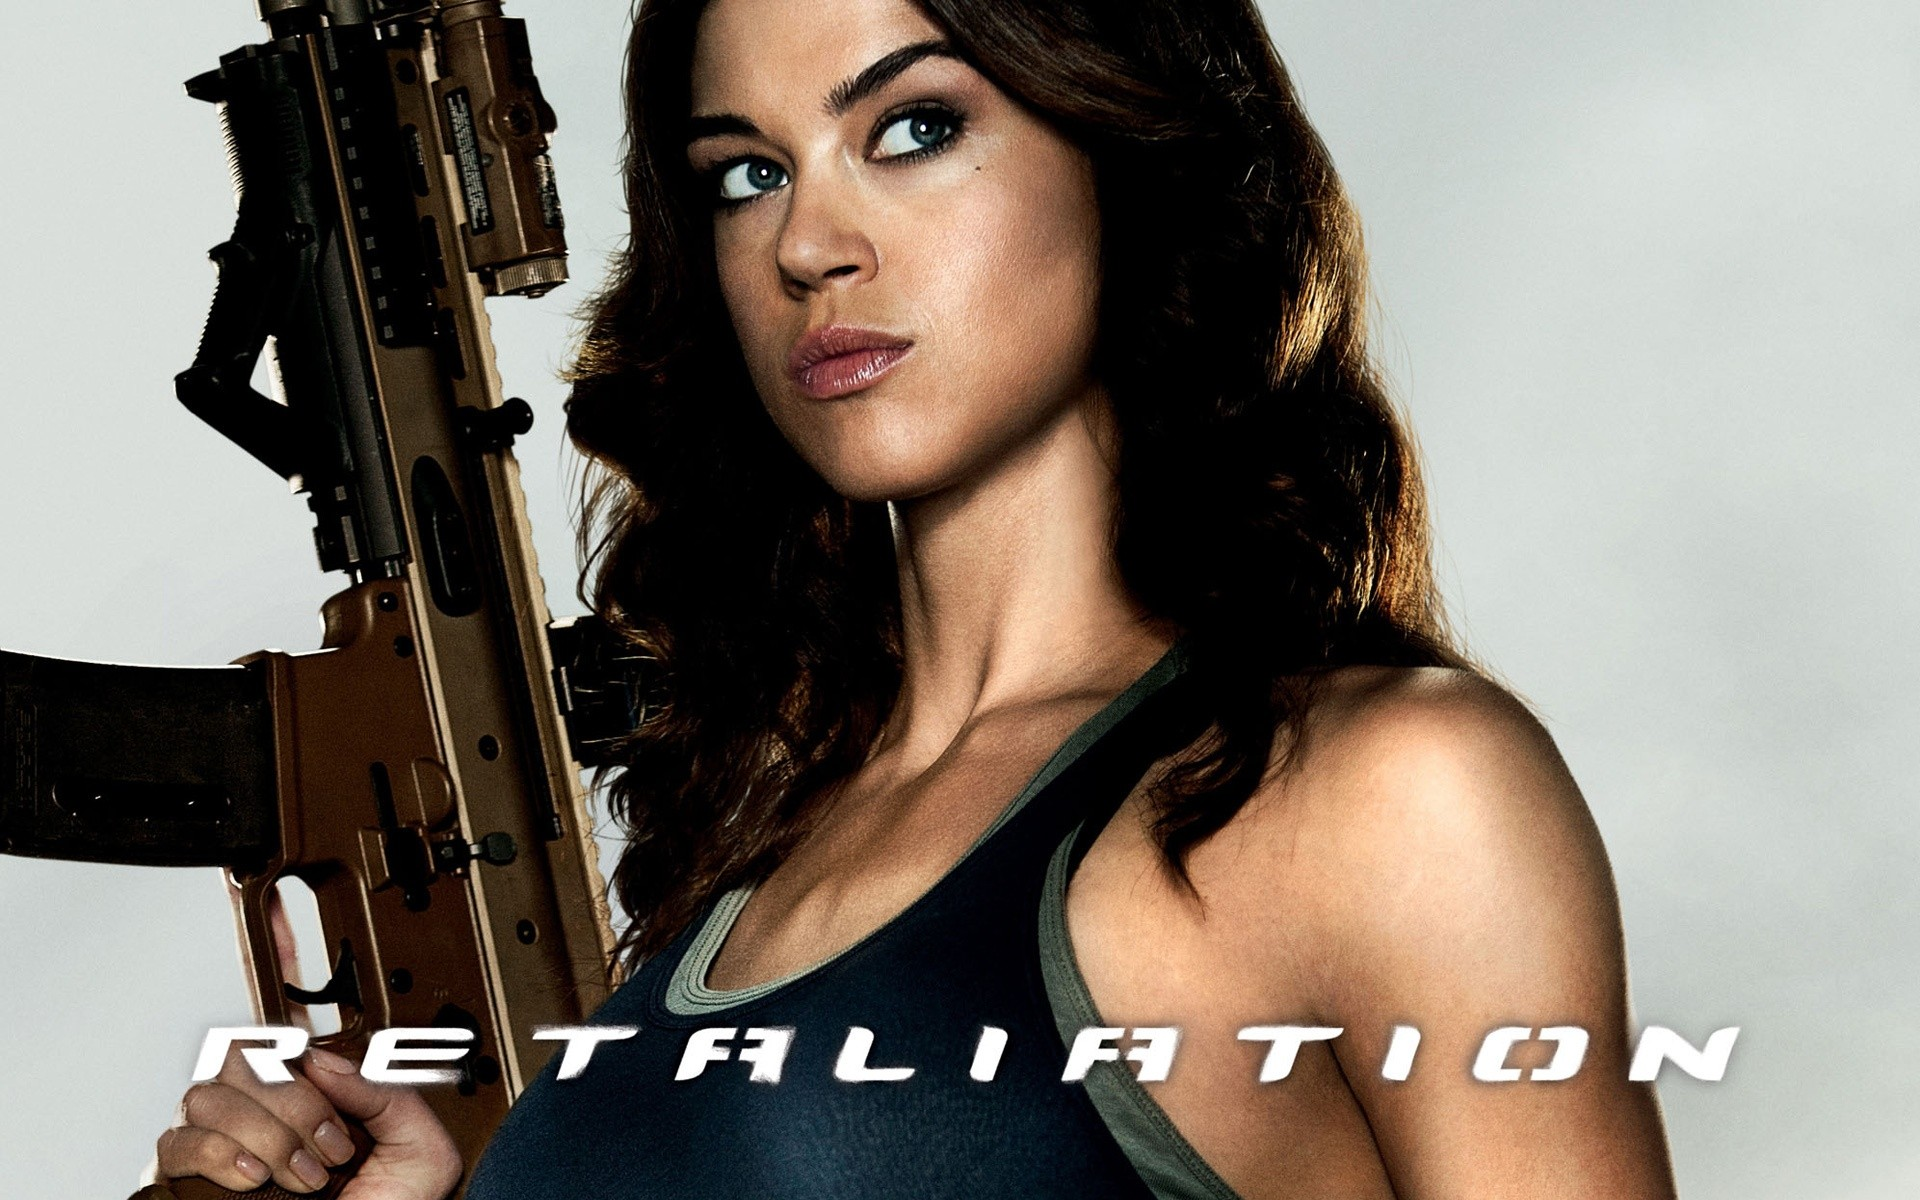 g.i. joe: retaliation full hd wallpaper and background image